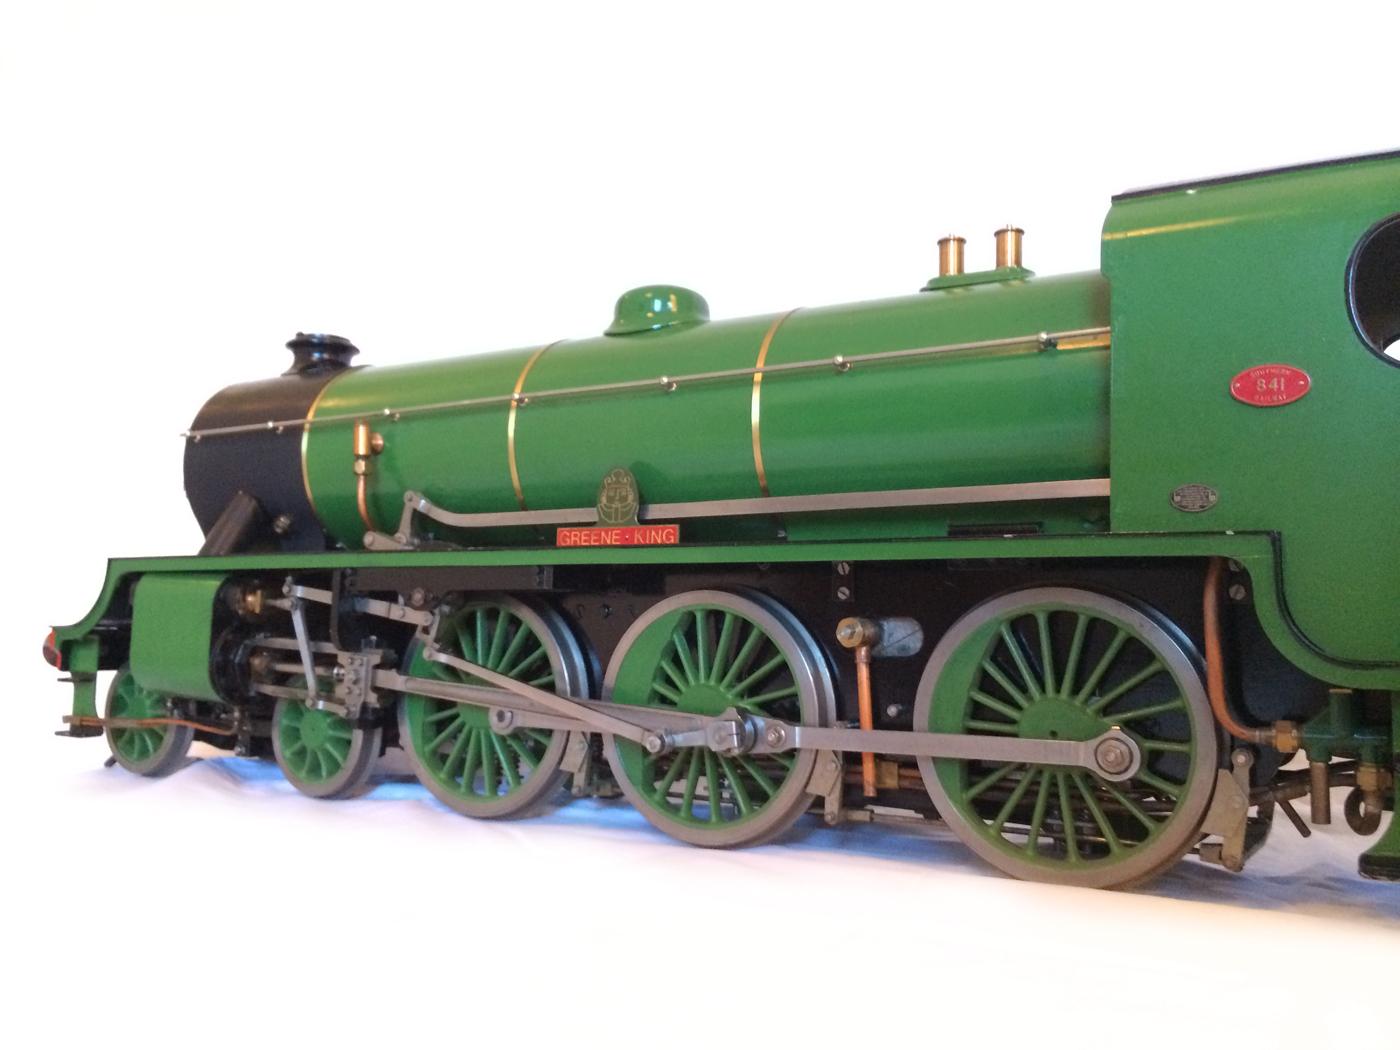 test Southern King Arthur live steam miniature locomotive for sale 13